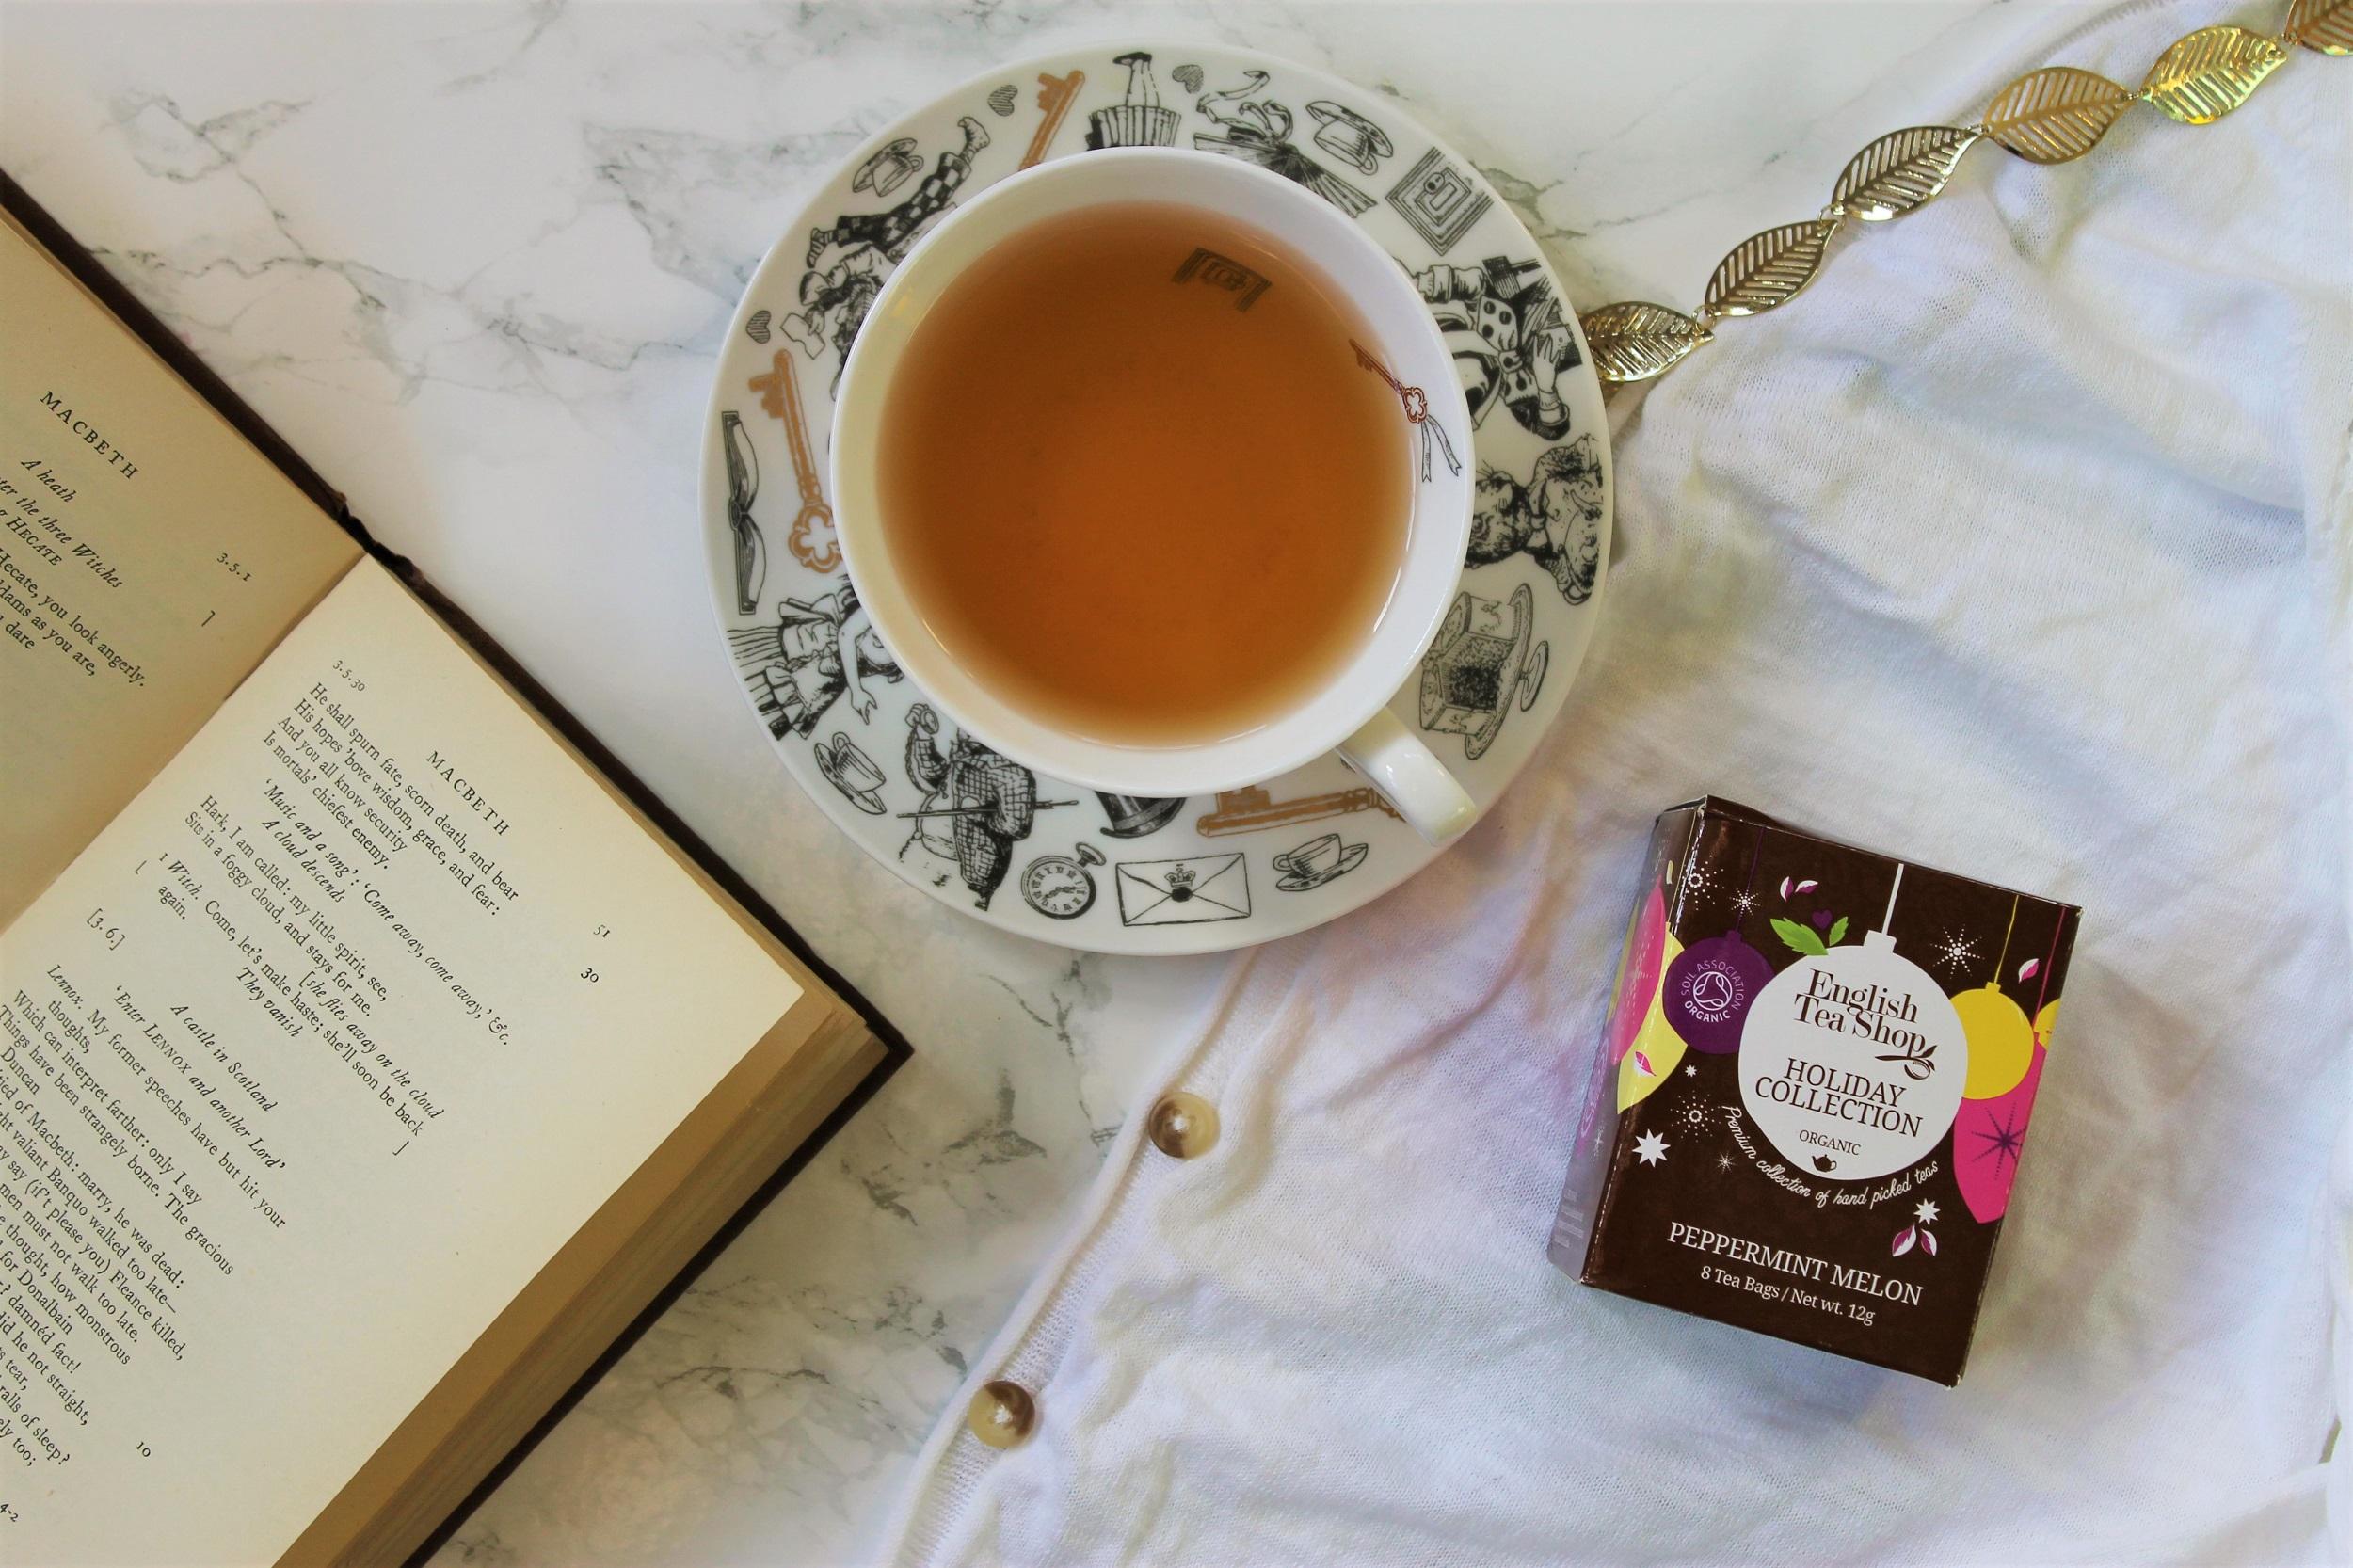 English Tea Shop Peppermint Melon Tea Review